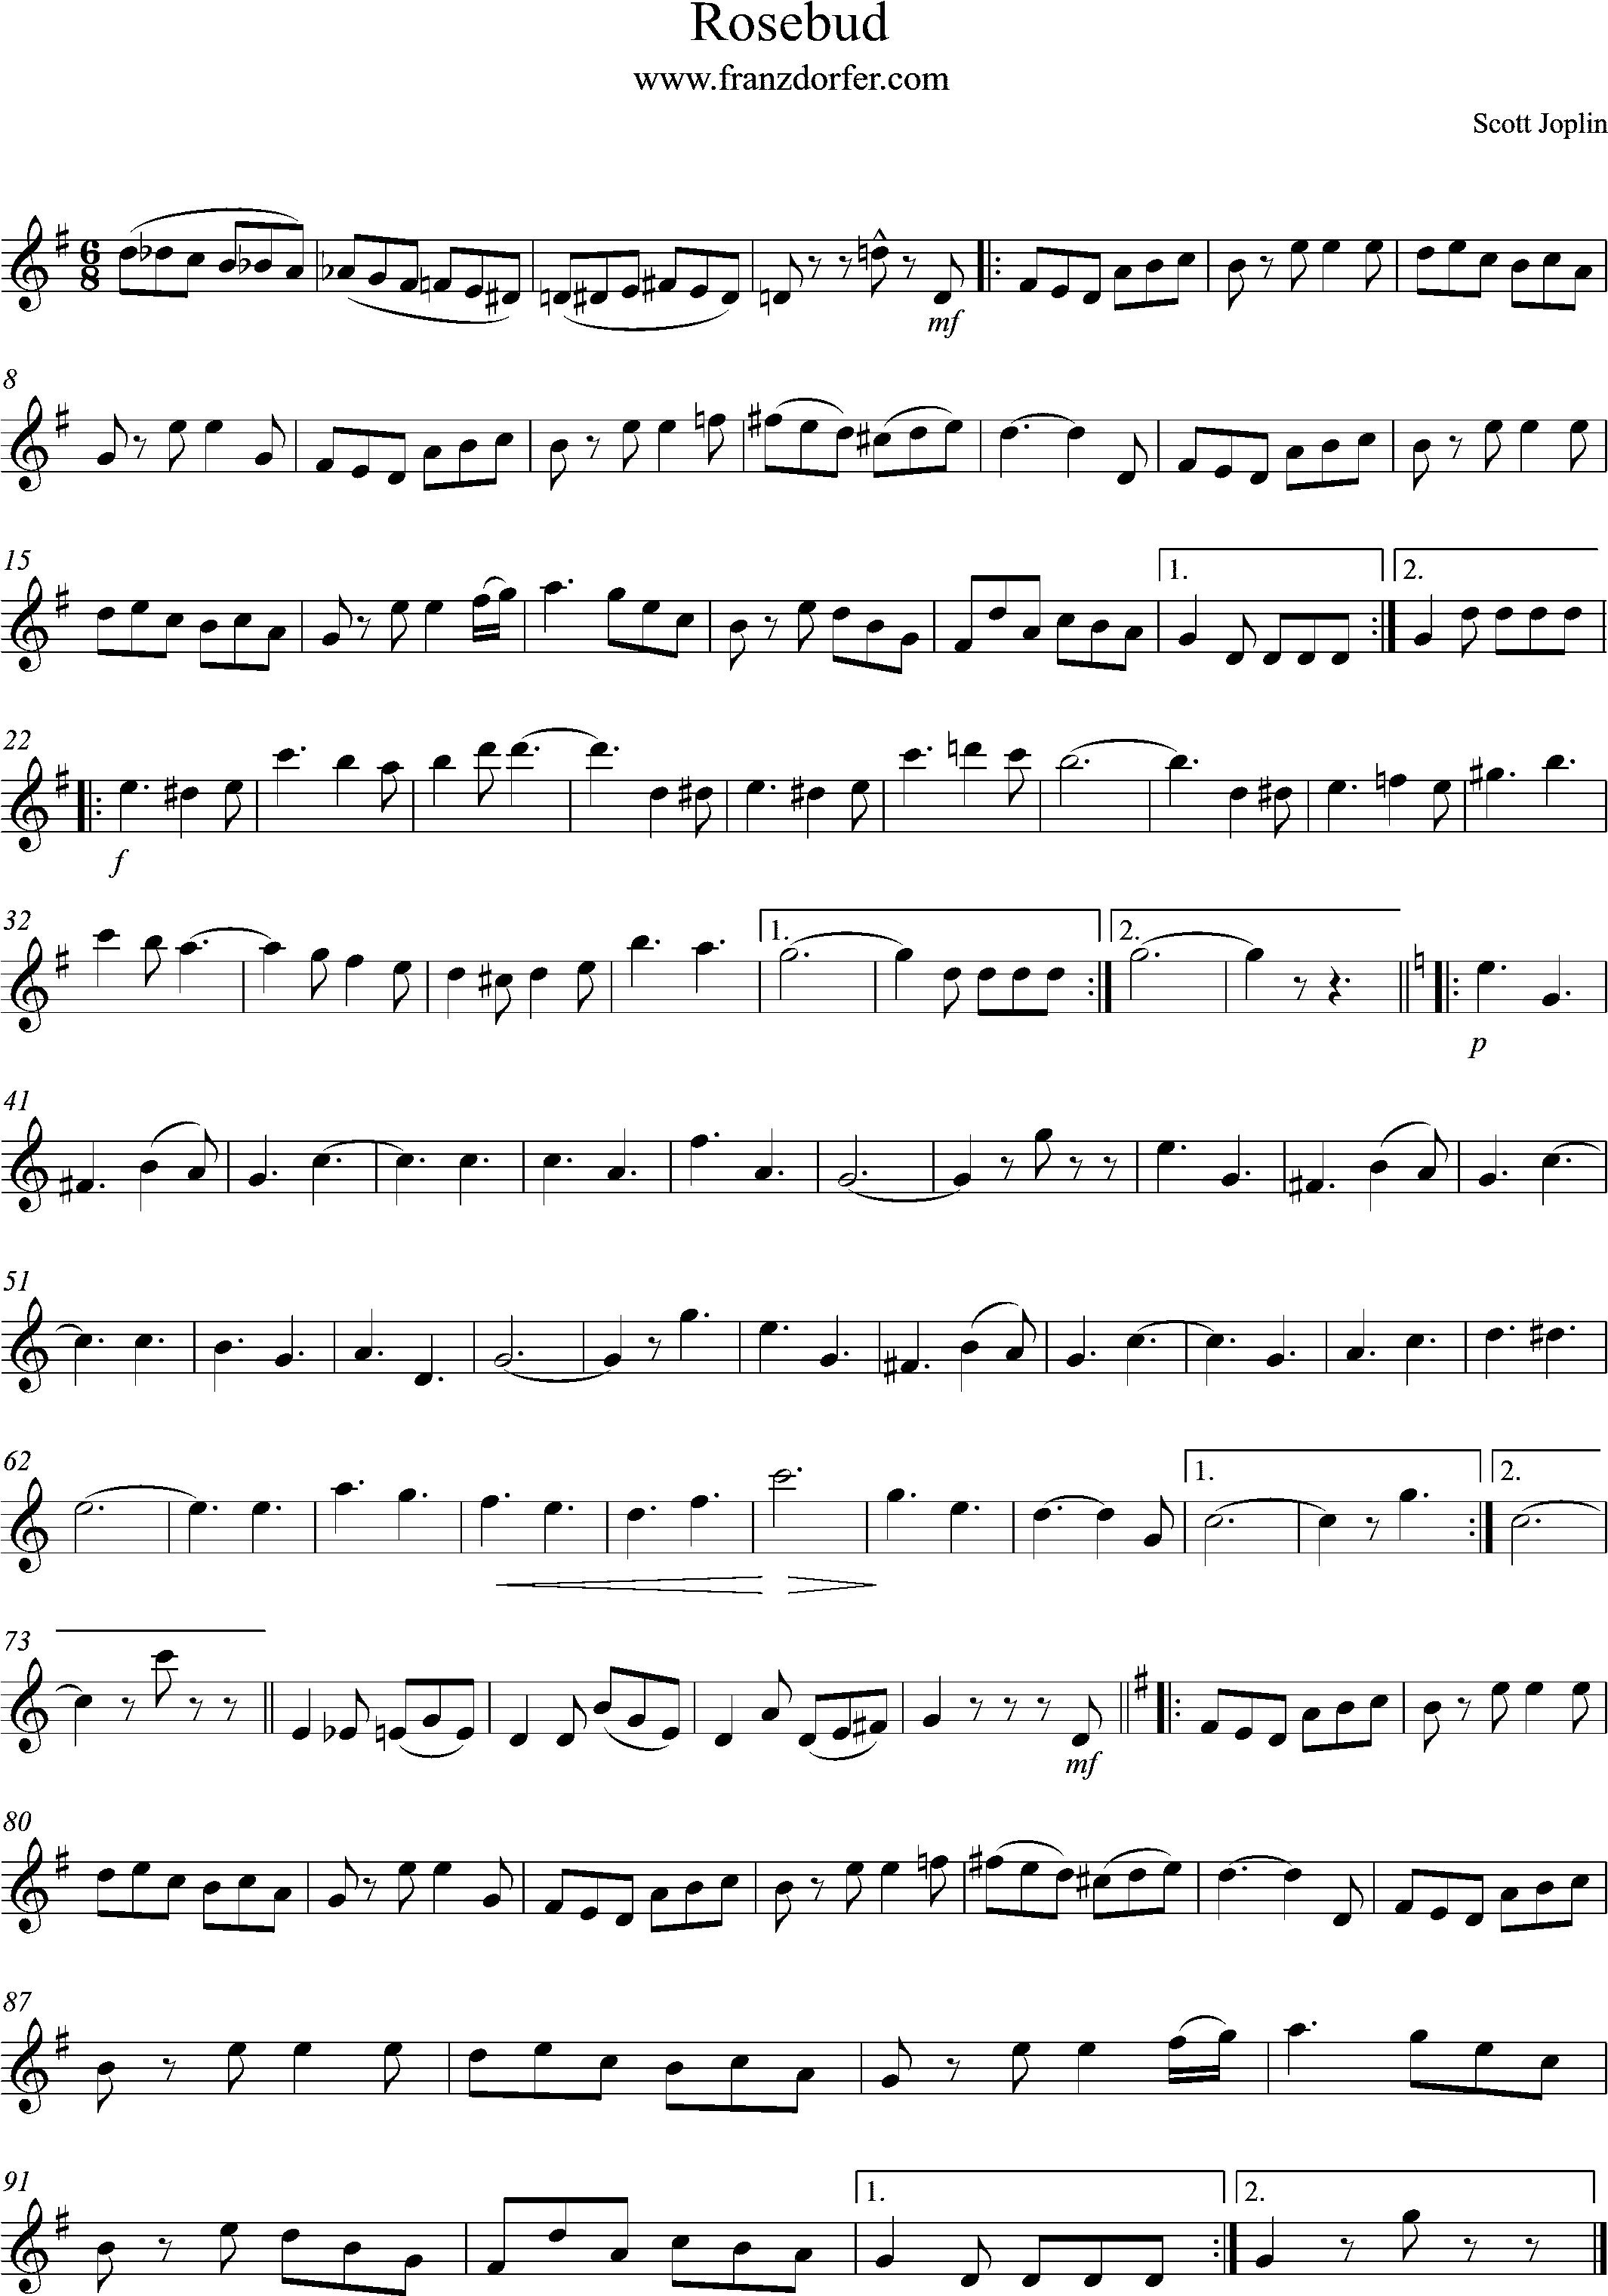 Solopart, sheetmusic- Rosebus, G-Major